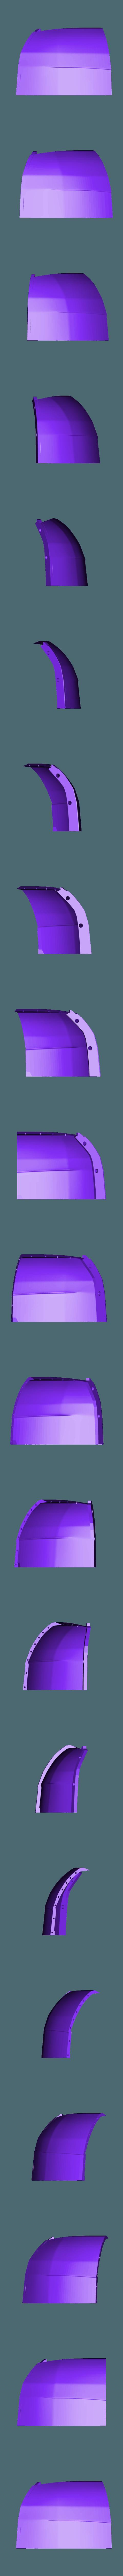 Top left 1.stl Download STL file Iron Man Mark 42  • 3D printing object, SKUPERDIY